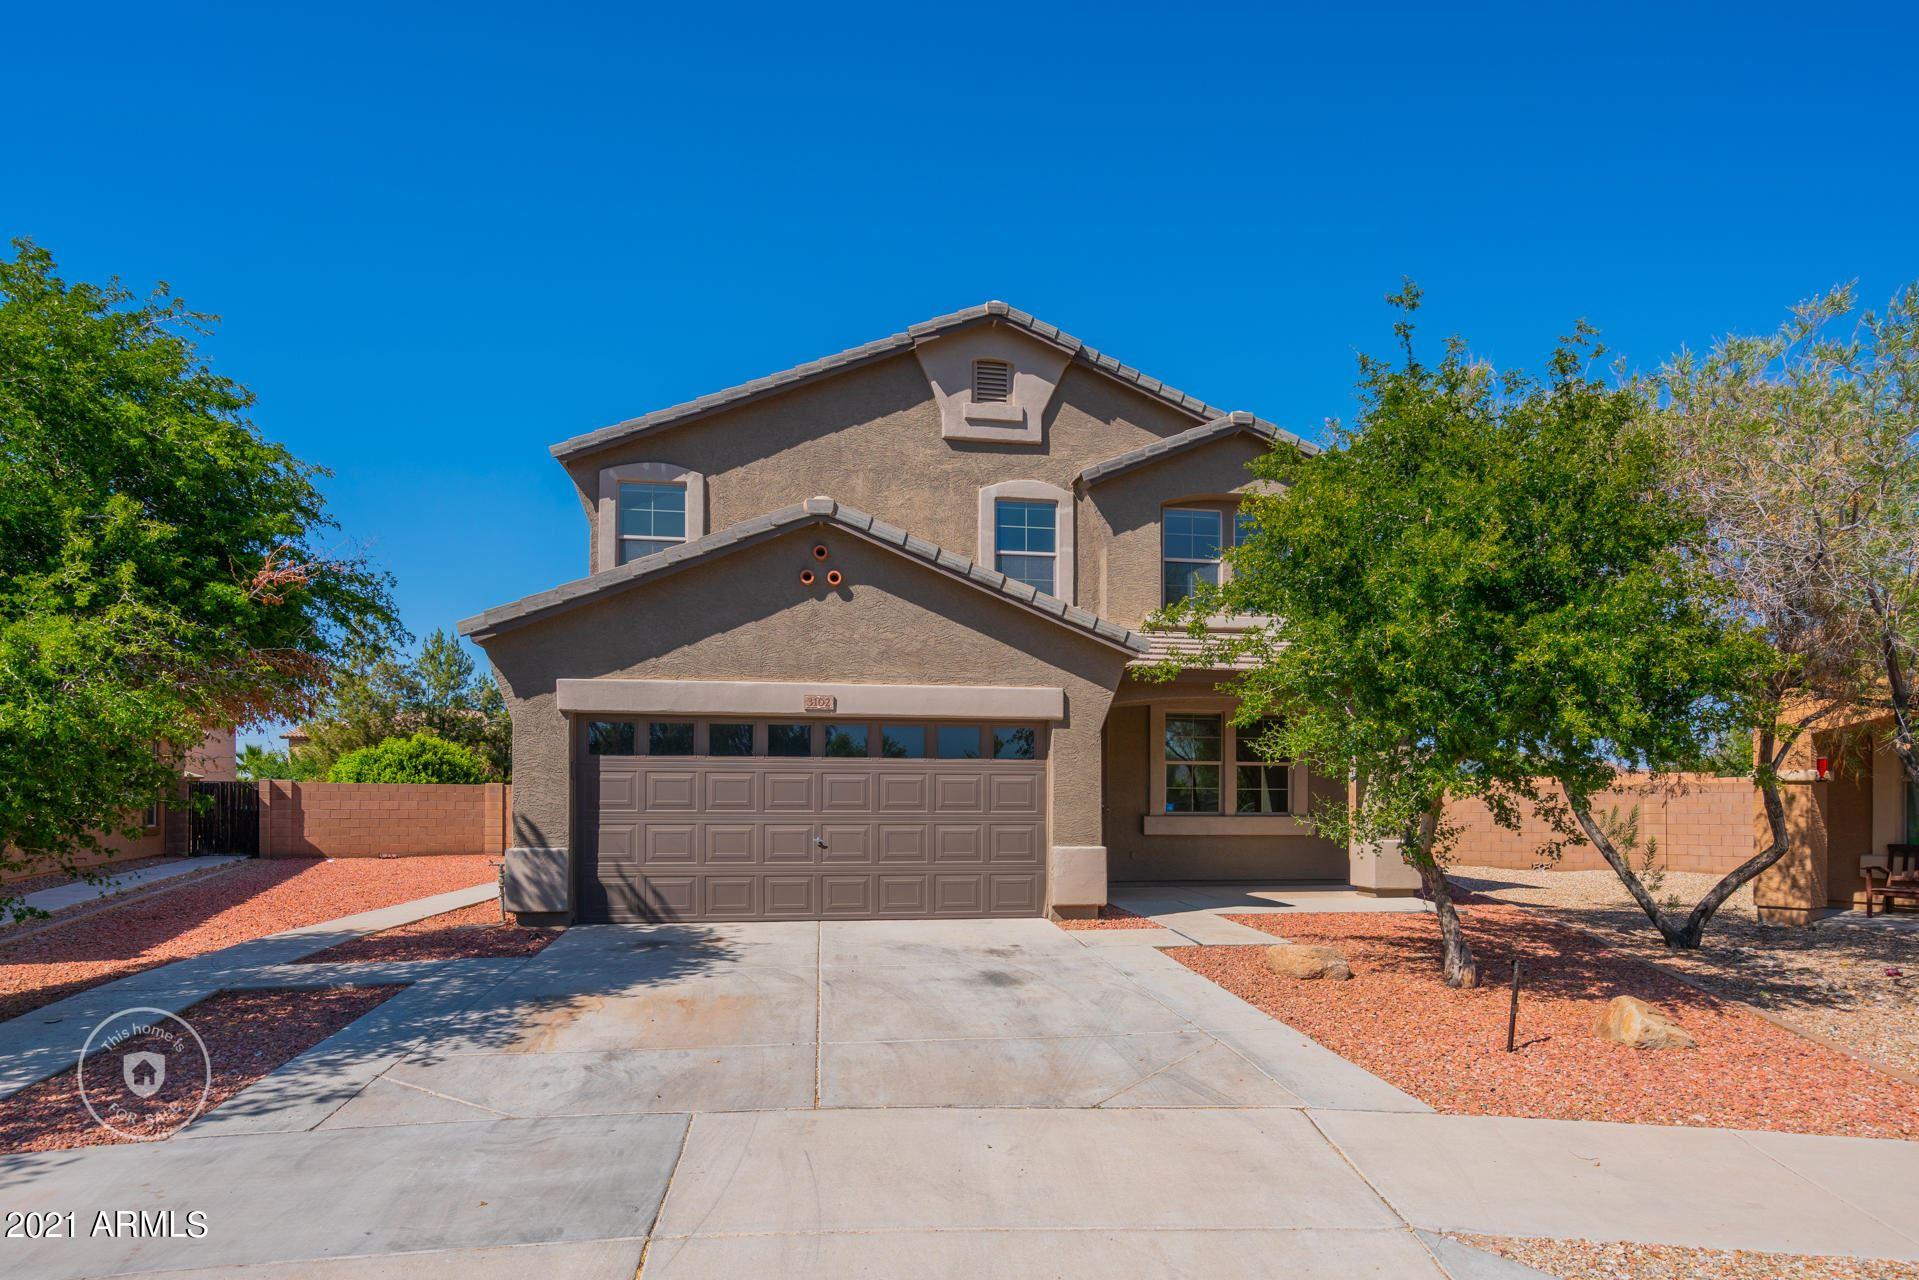 3102 W T RYAN Lane, Phoenix, AZ 85041 - MLS#: 6240856